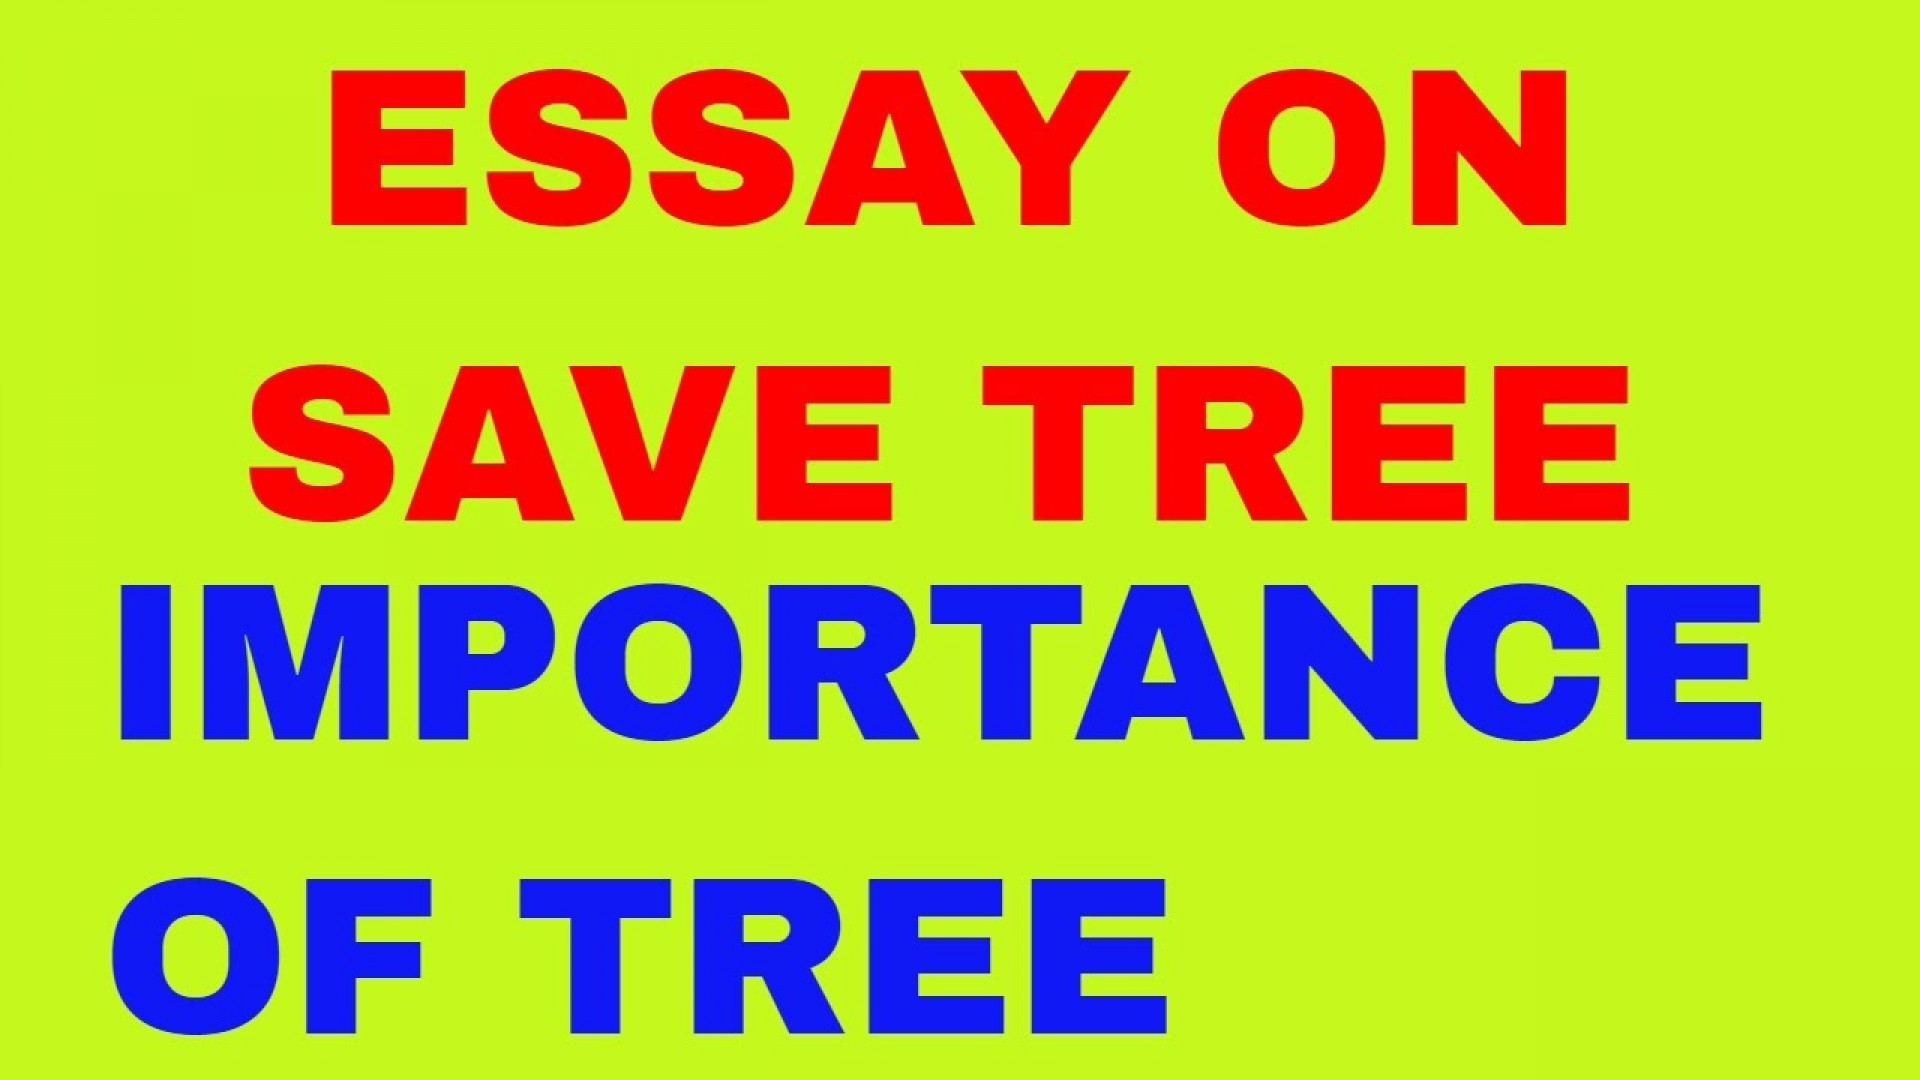 004 Description Of Trees For Essays Essay Example Striking 1920